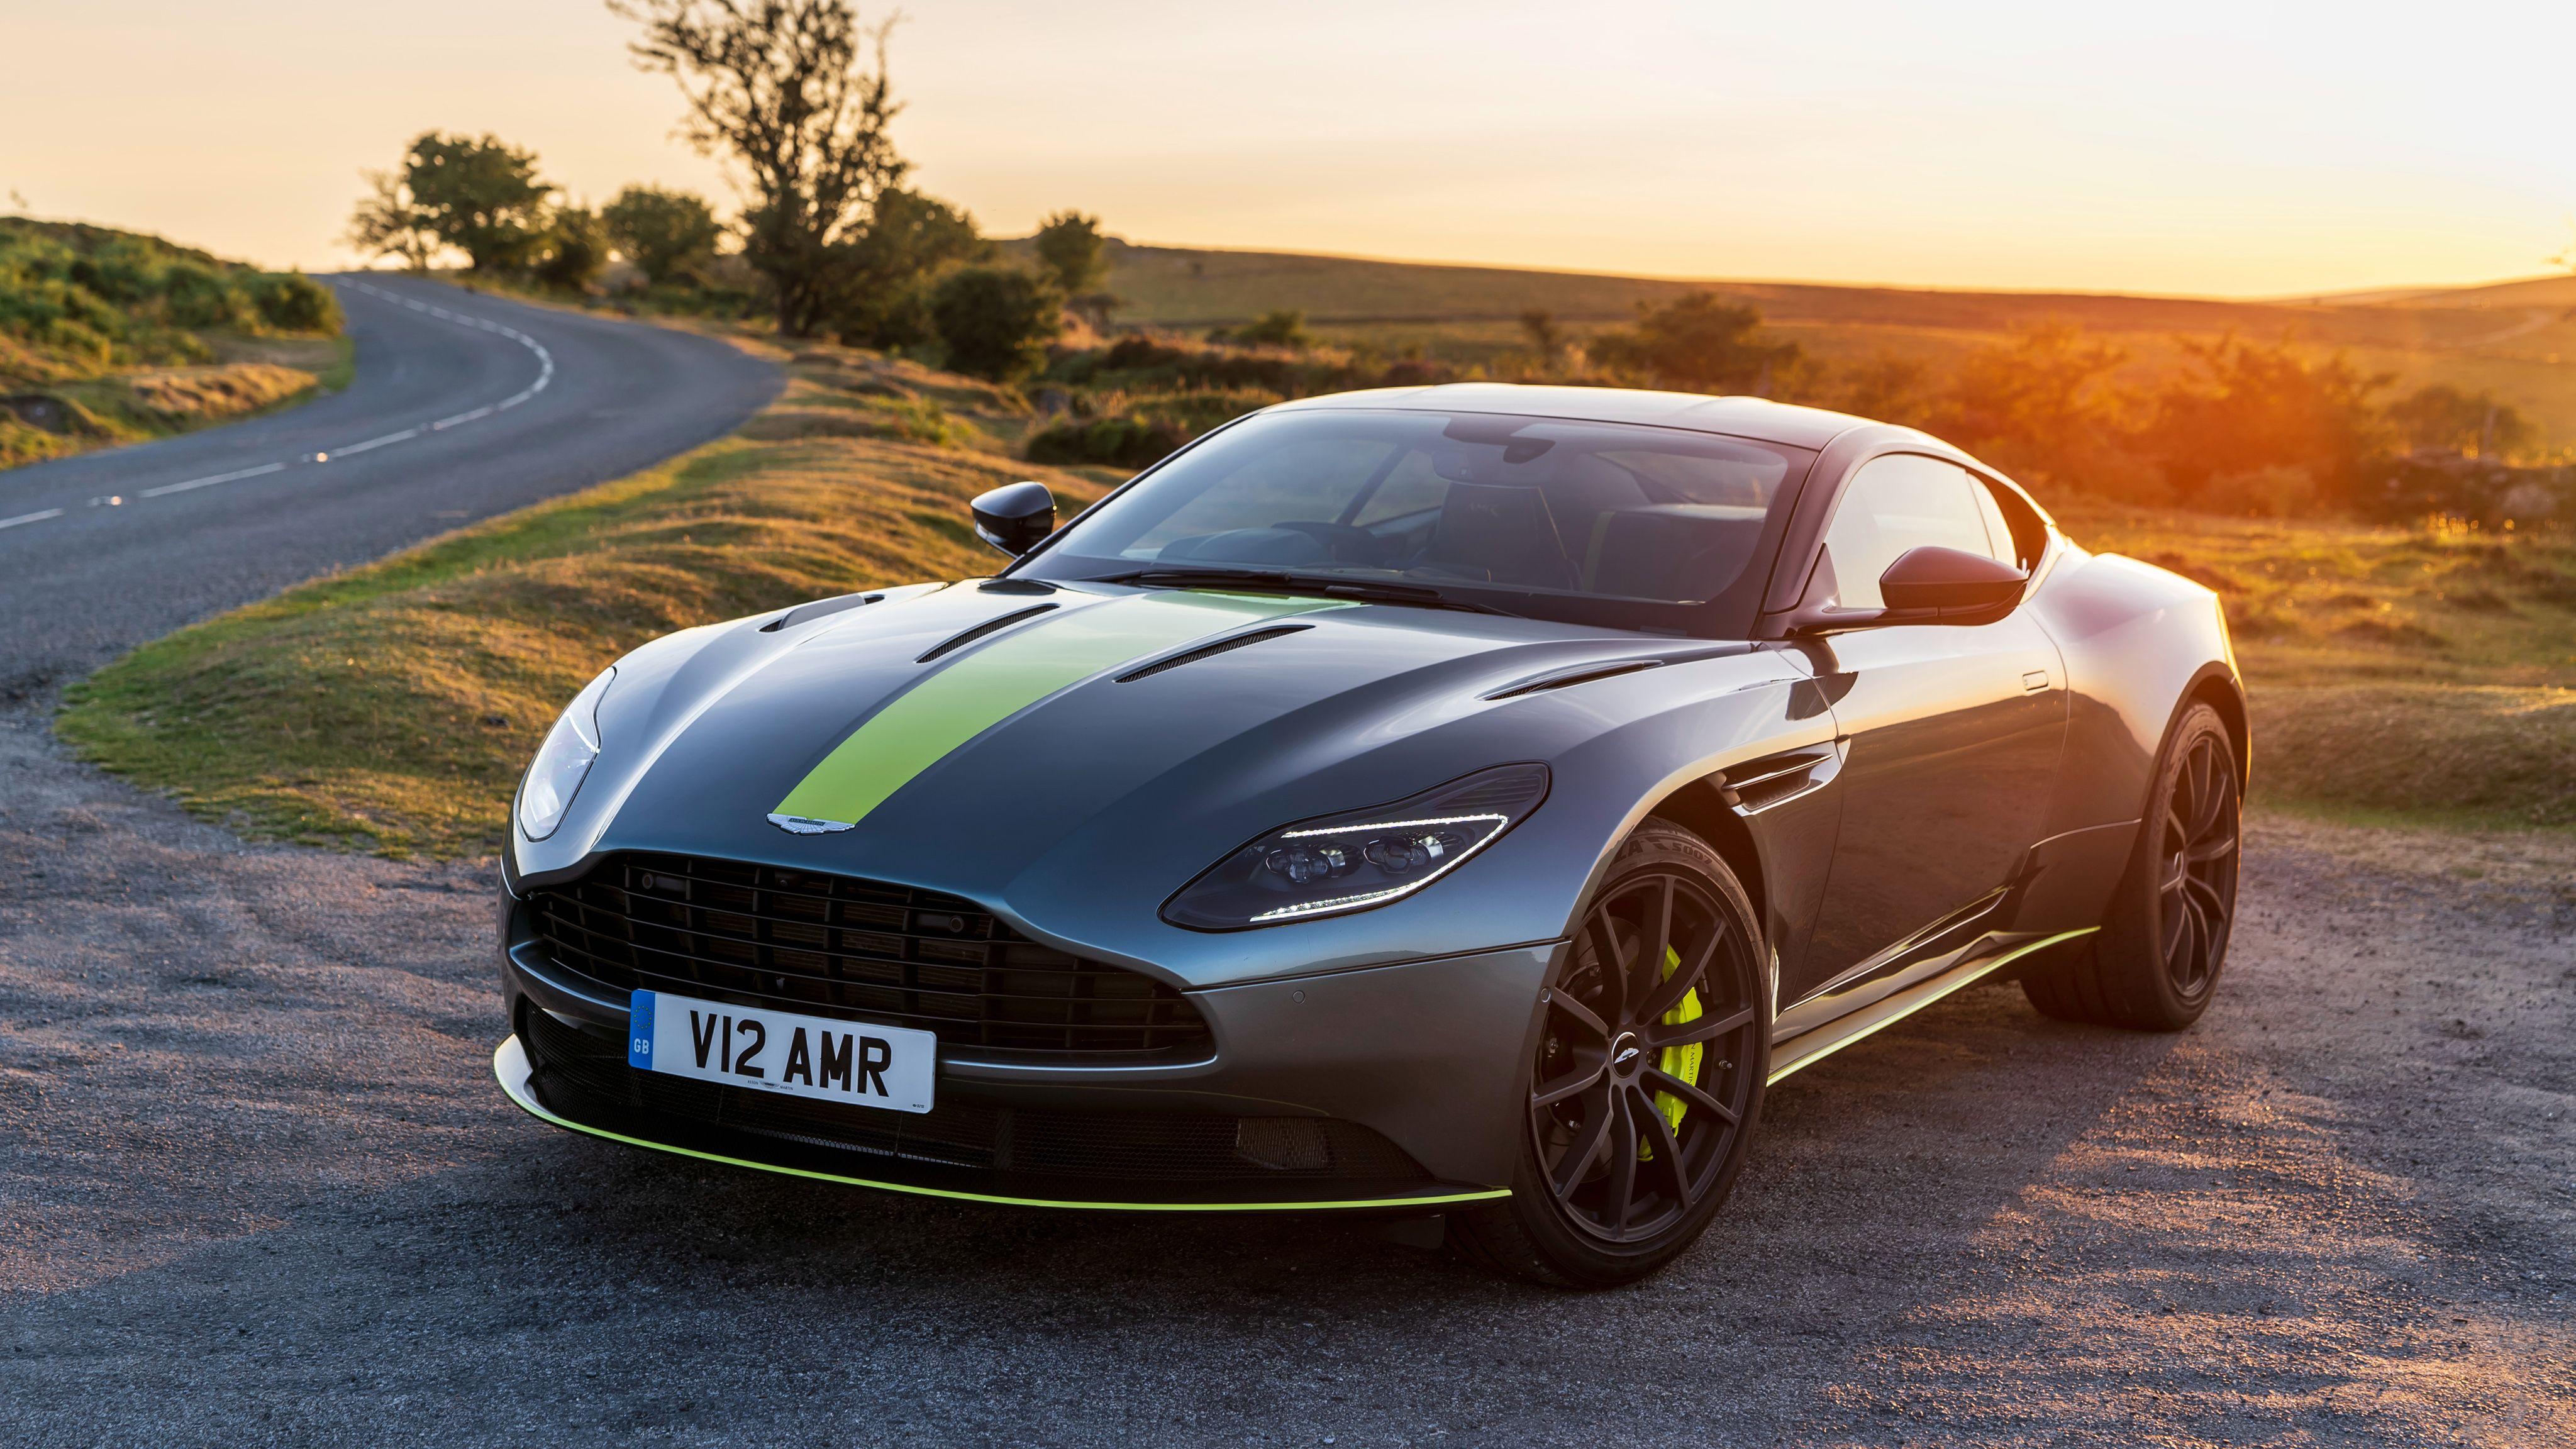 Aston Martin Db11 Qhd Wallpaper